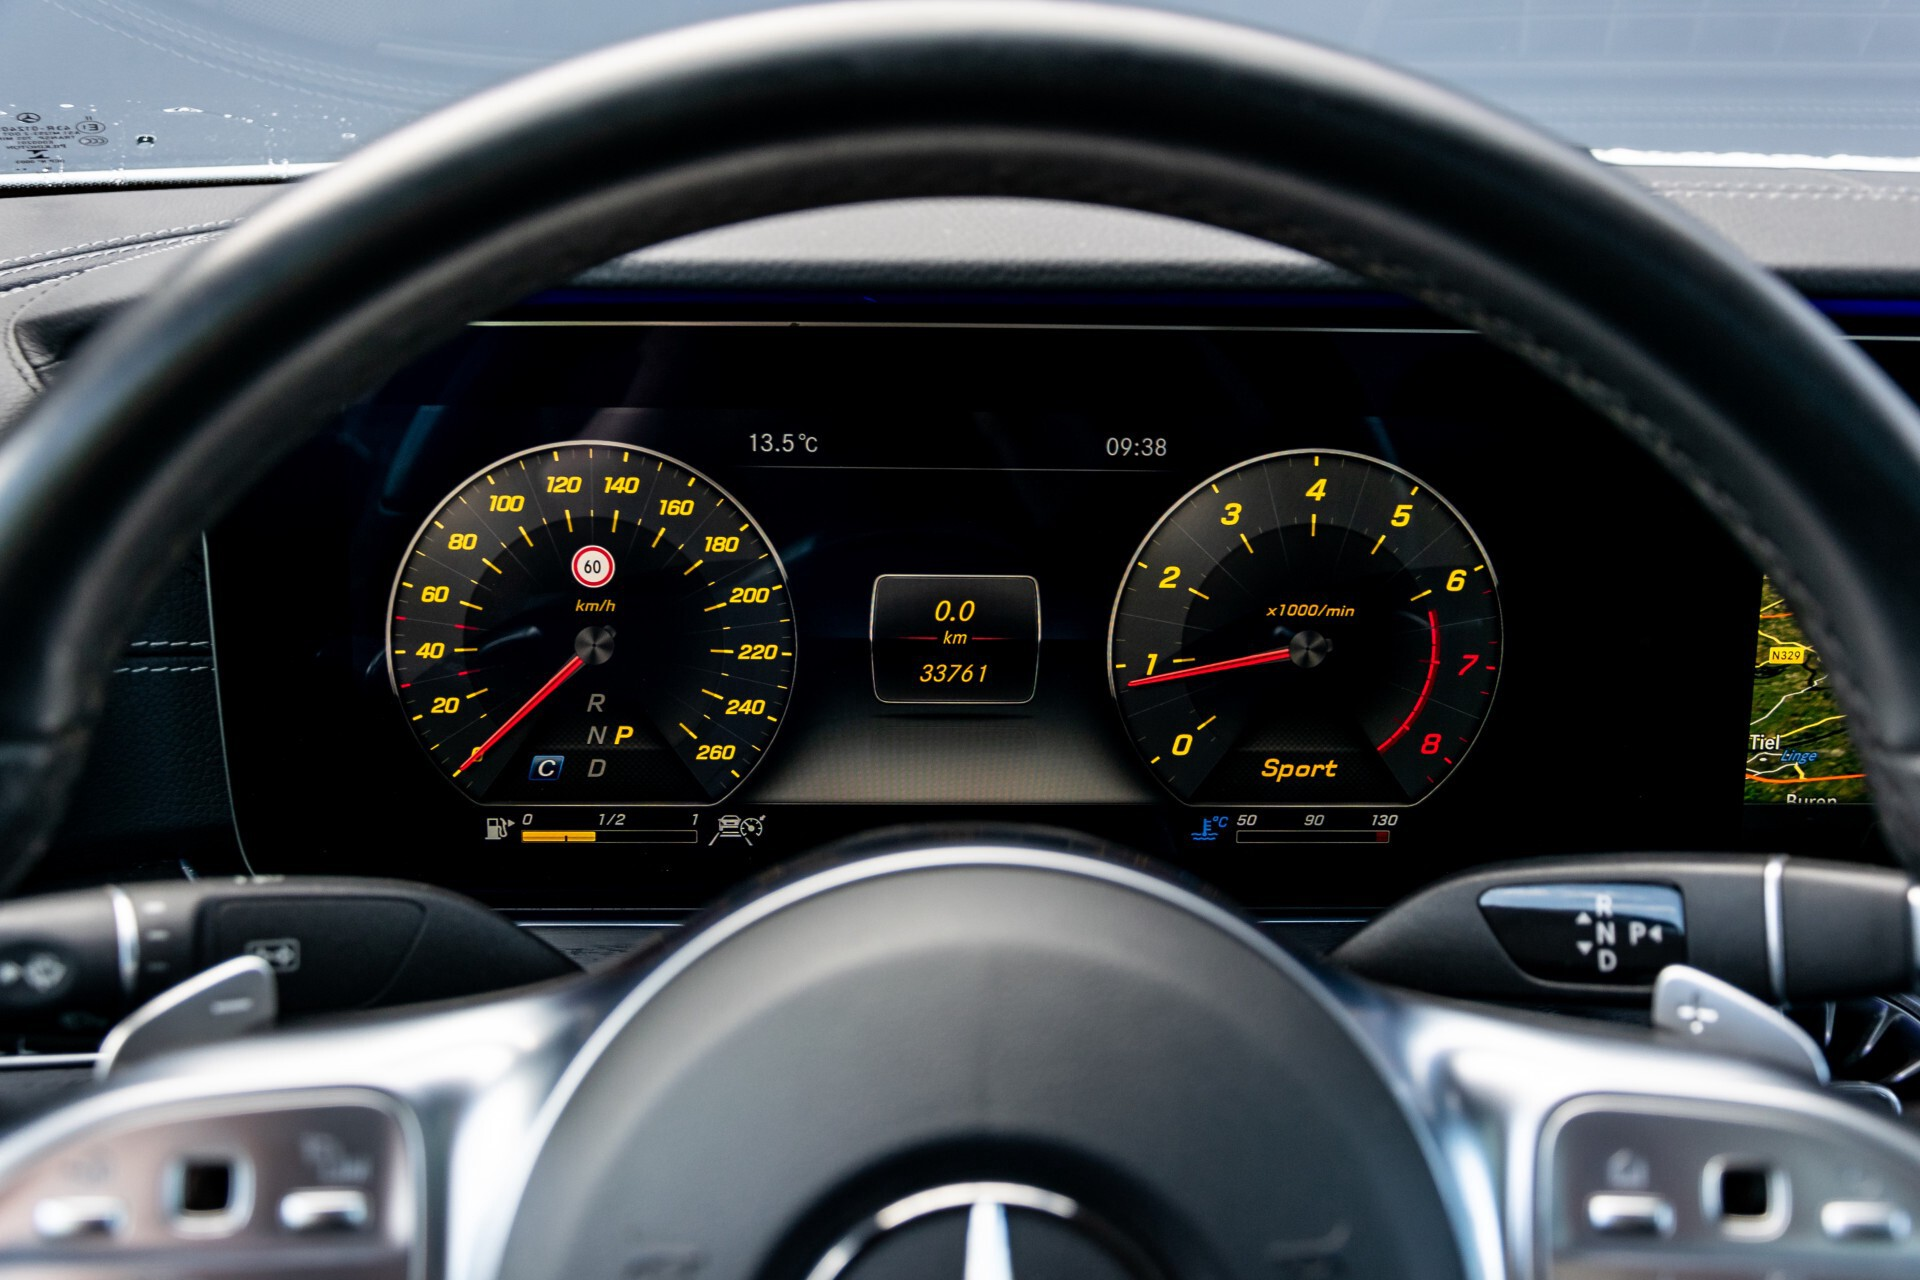 Mercedes-Benz E-Klasse Coupé 300 AMG Panorama/Rij-assist/Keyless/Massage/Memory/HUD/Standkachel/Night Aut9 Foto 13